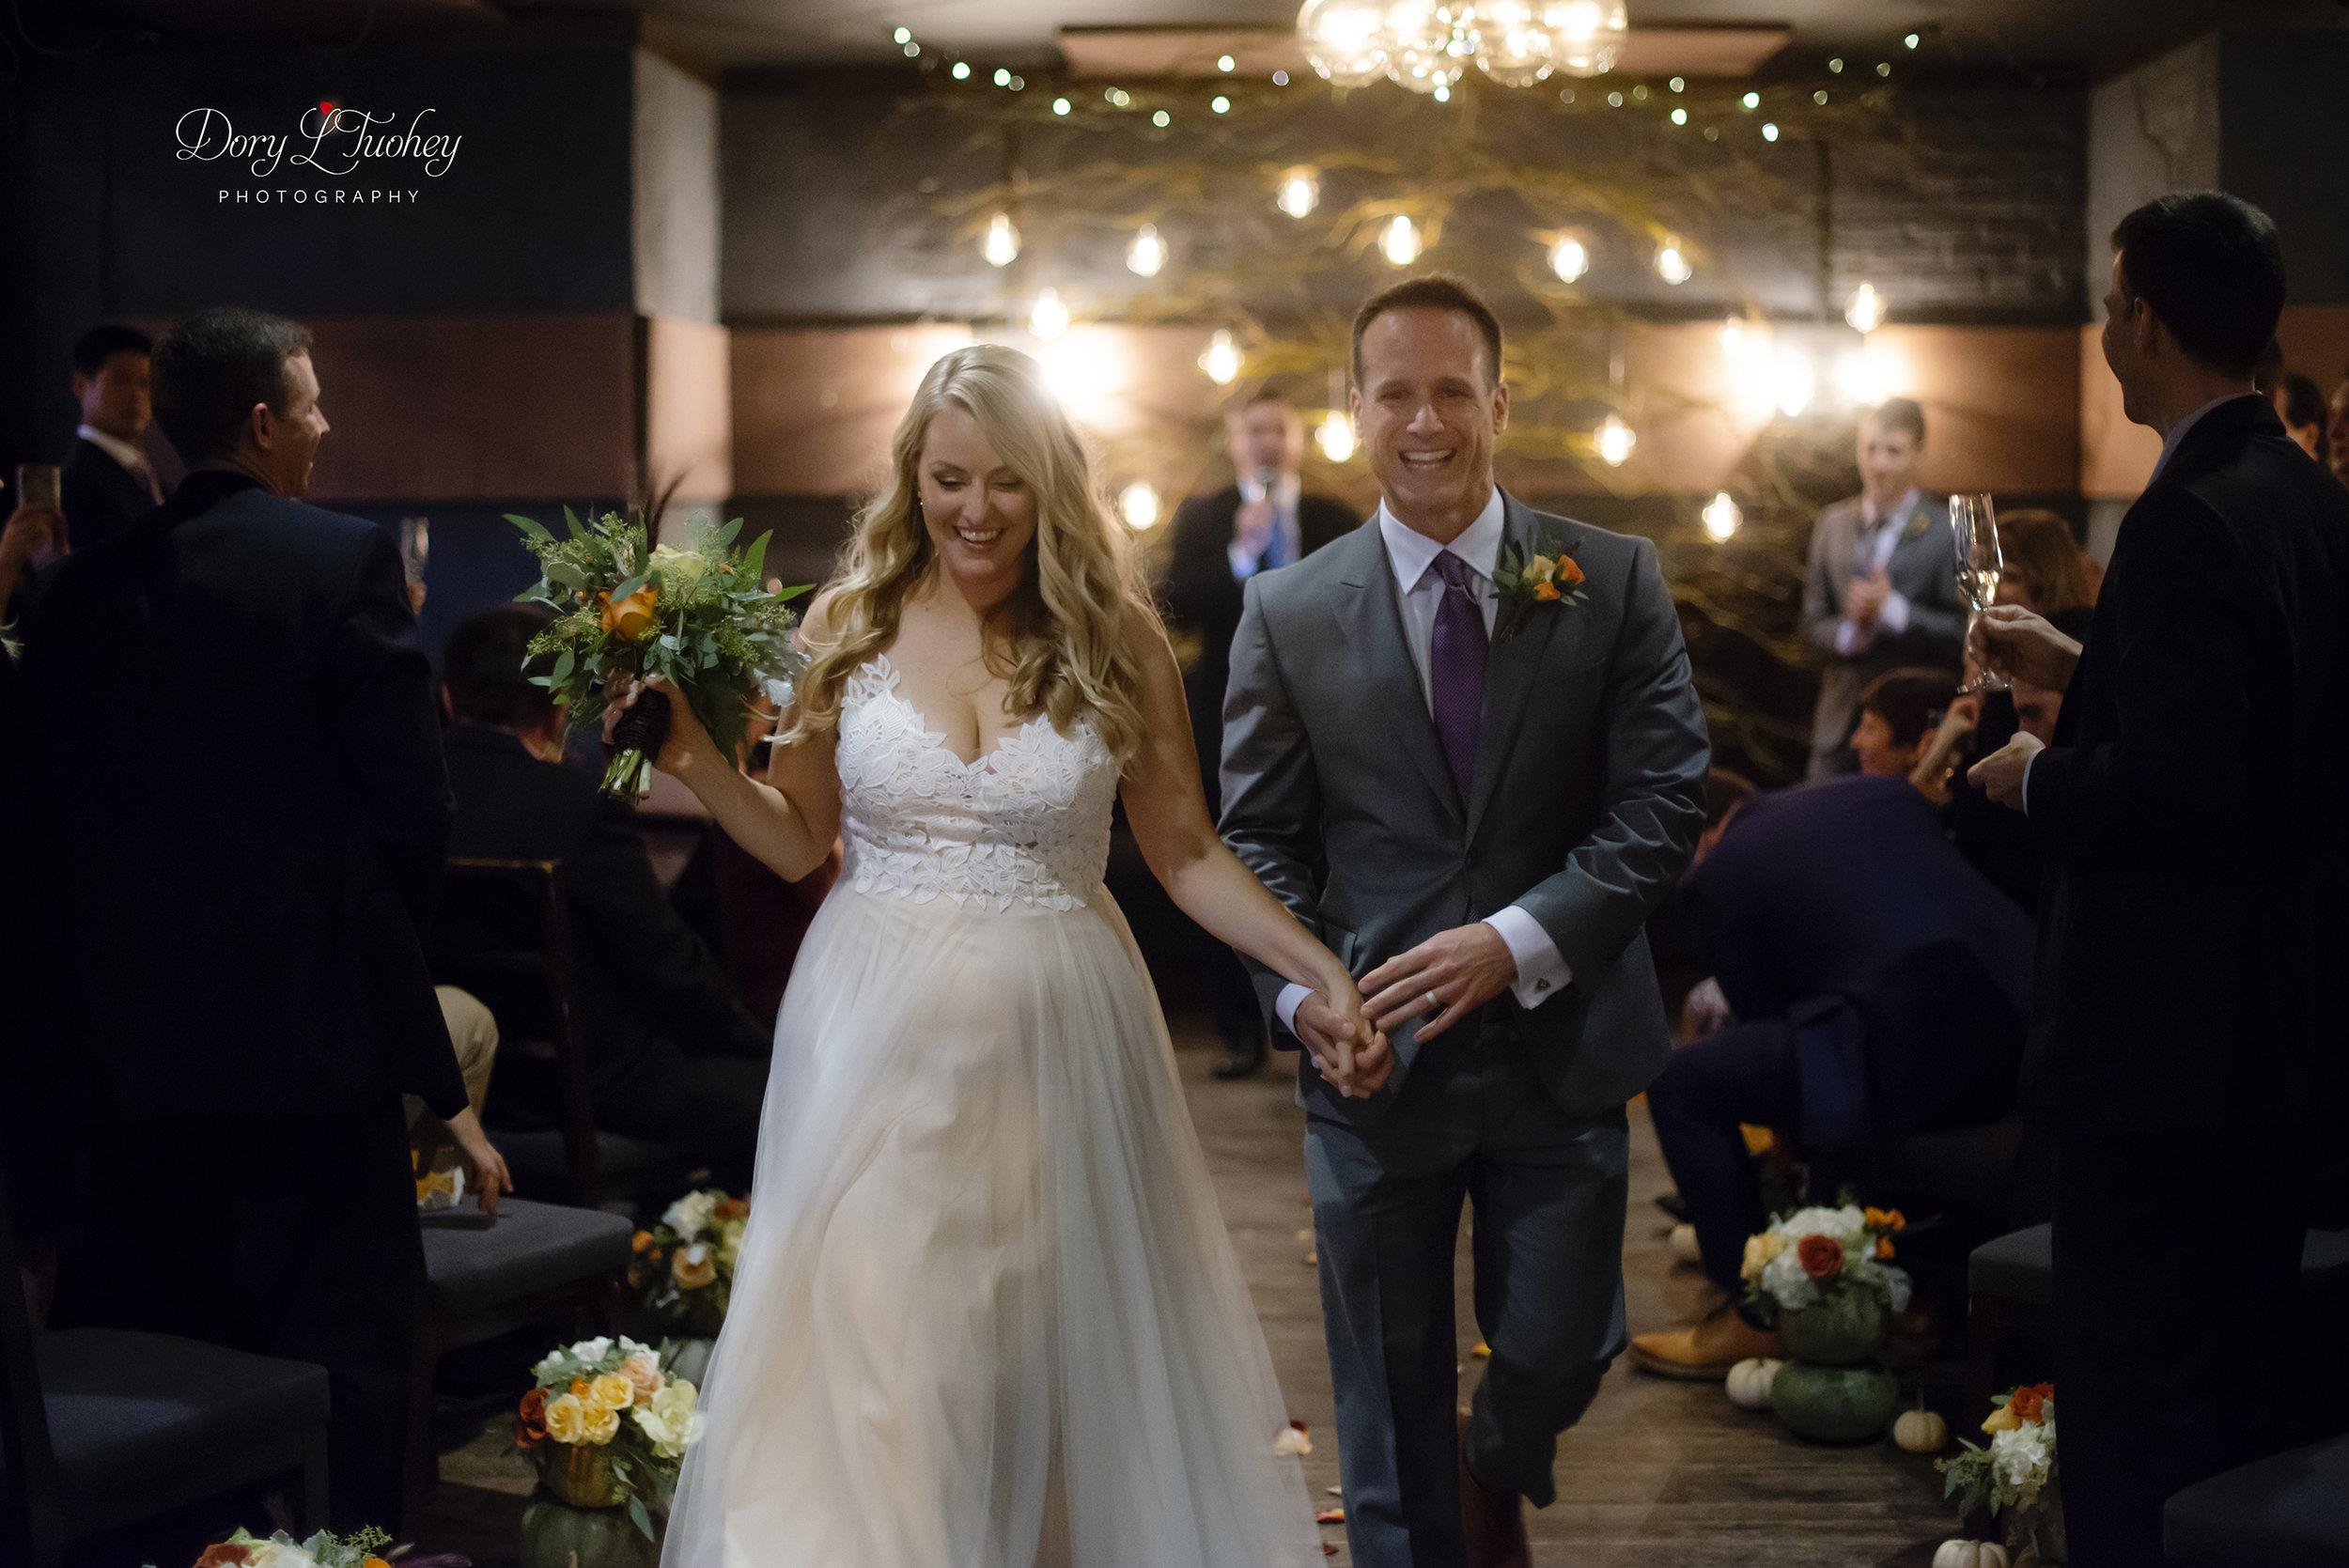 Rookery_chicago_dory_photographer_wedding_stairs_bhldn_love_dawson_16.jpg